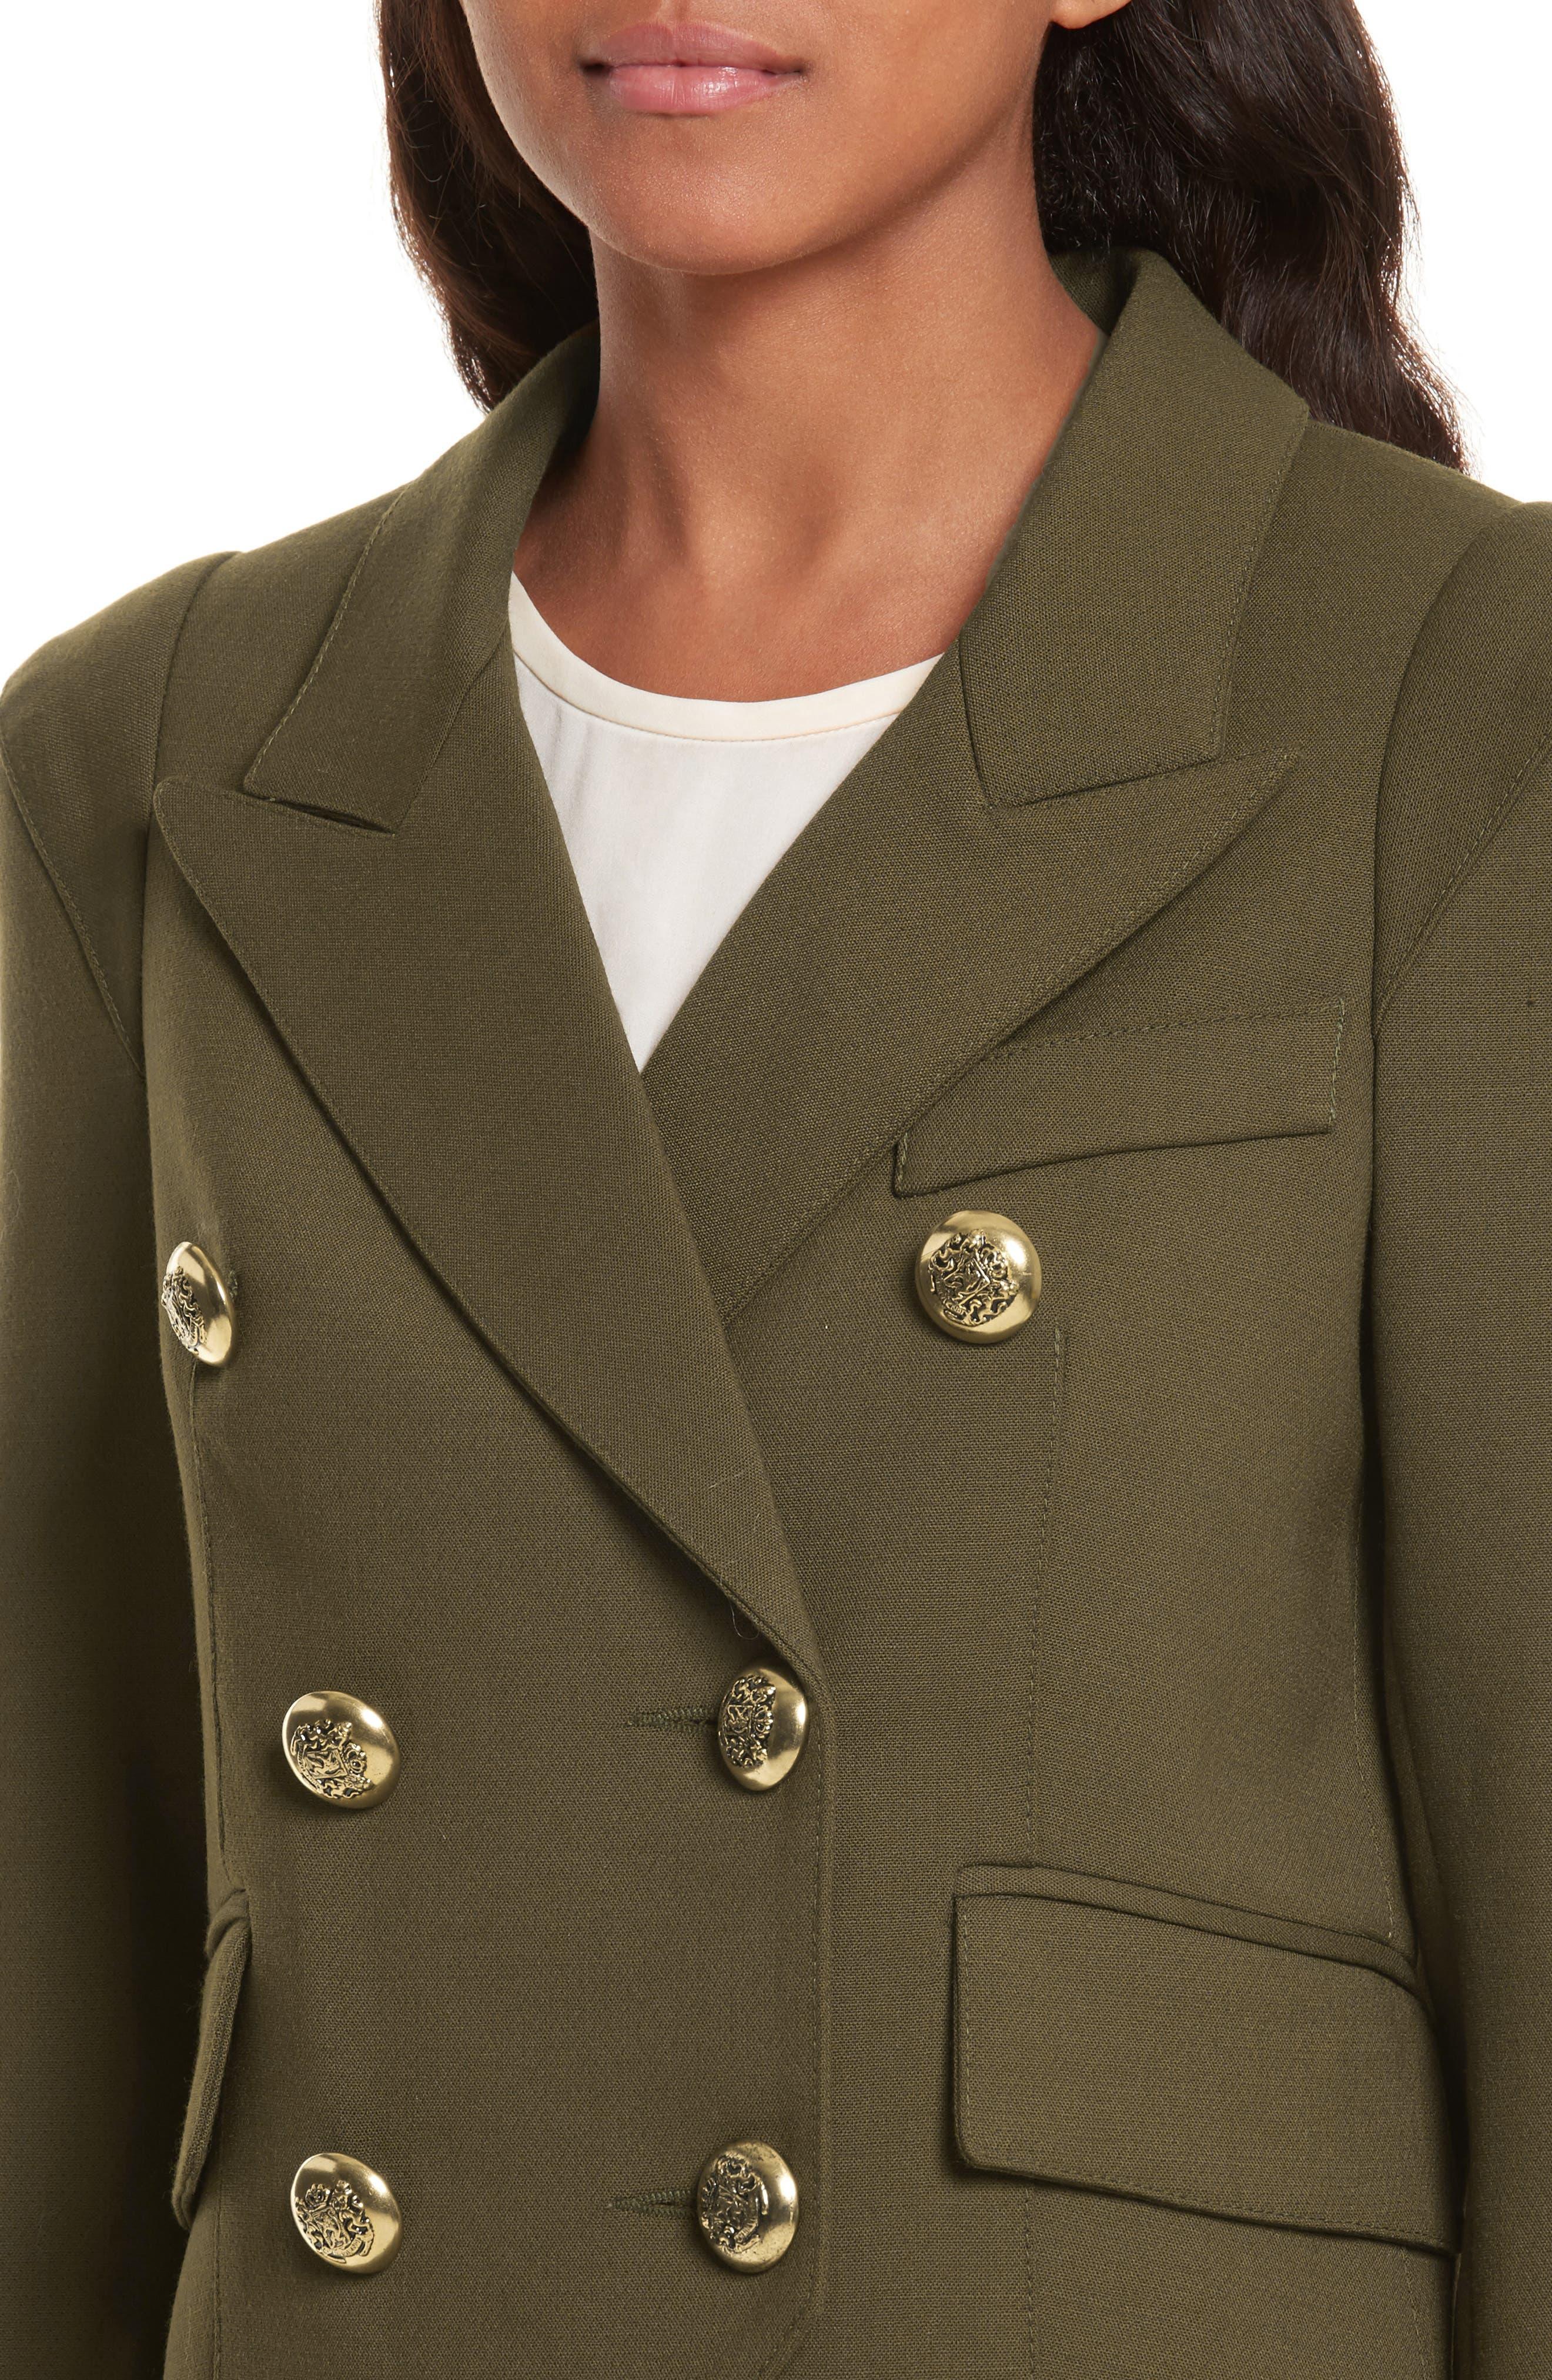 Pagoda Cadet Jacket,                             Alternate thumbnail 4, color,                             Army